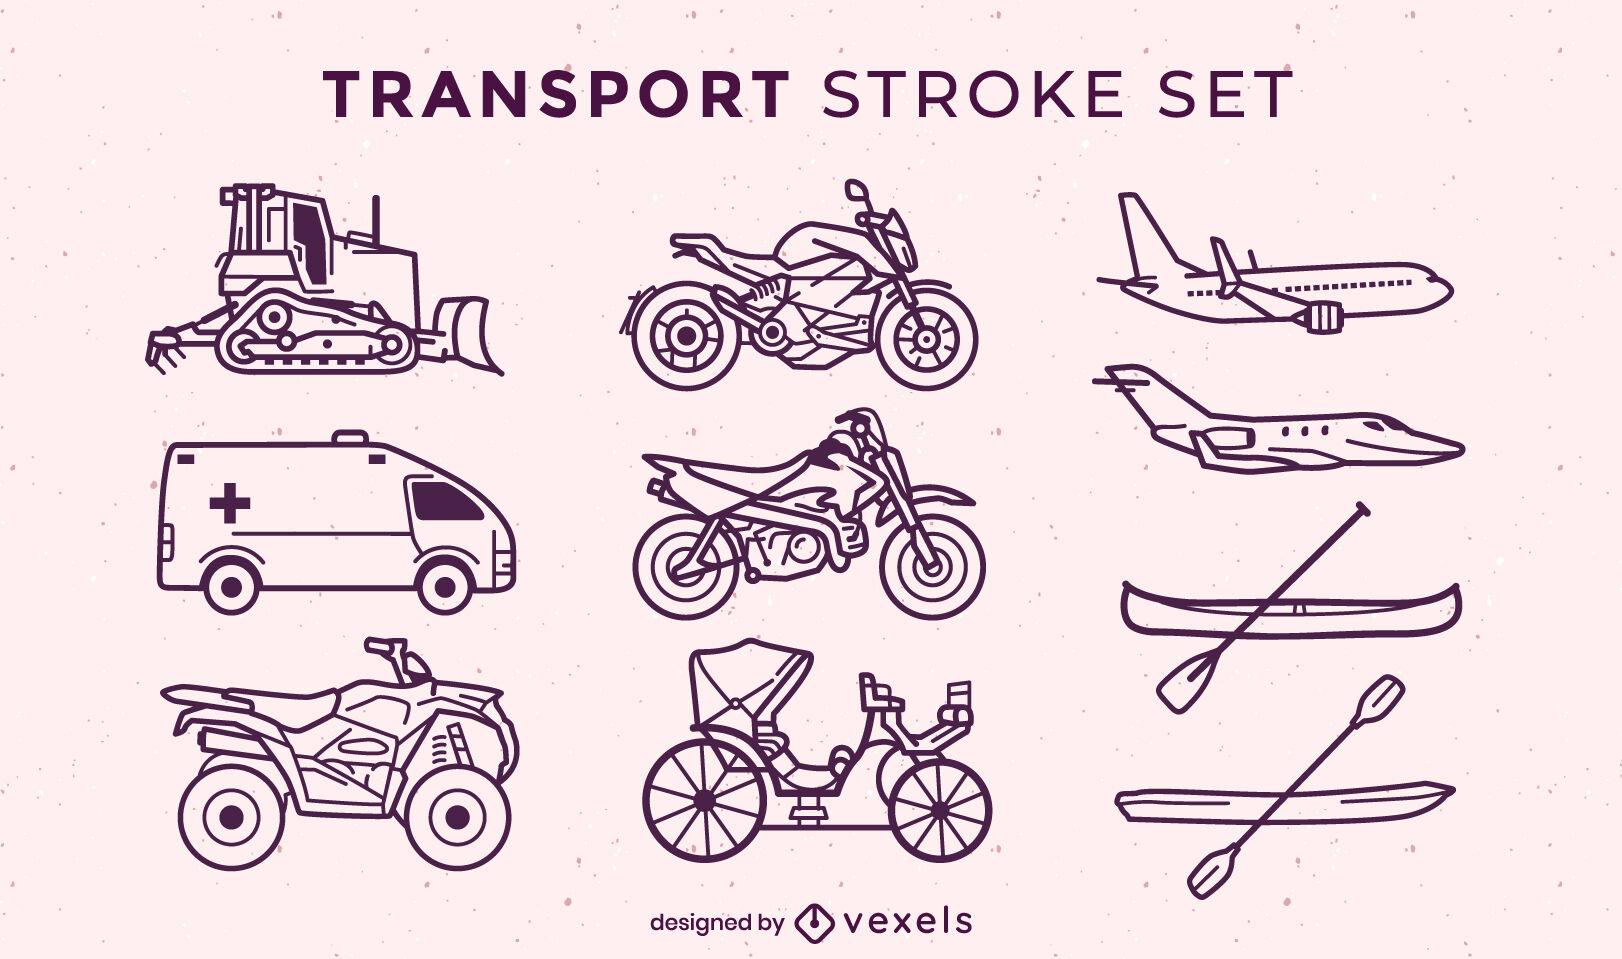 Transportation set of stroke elements